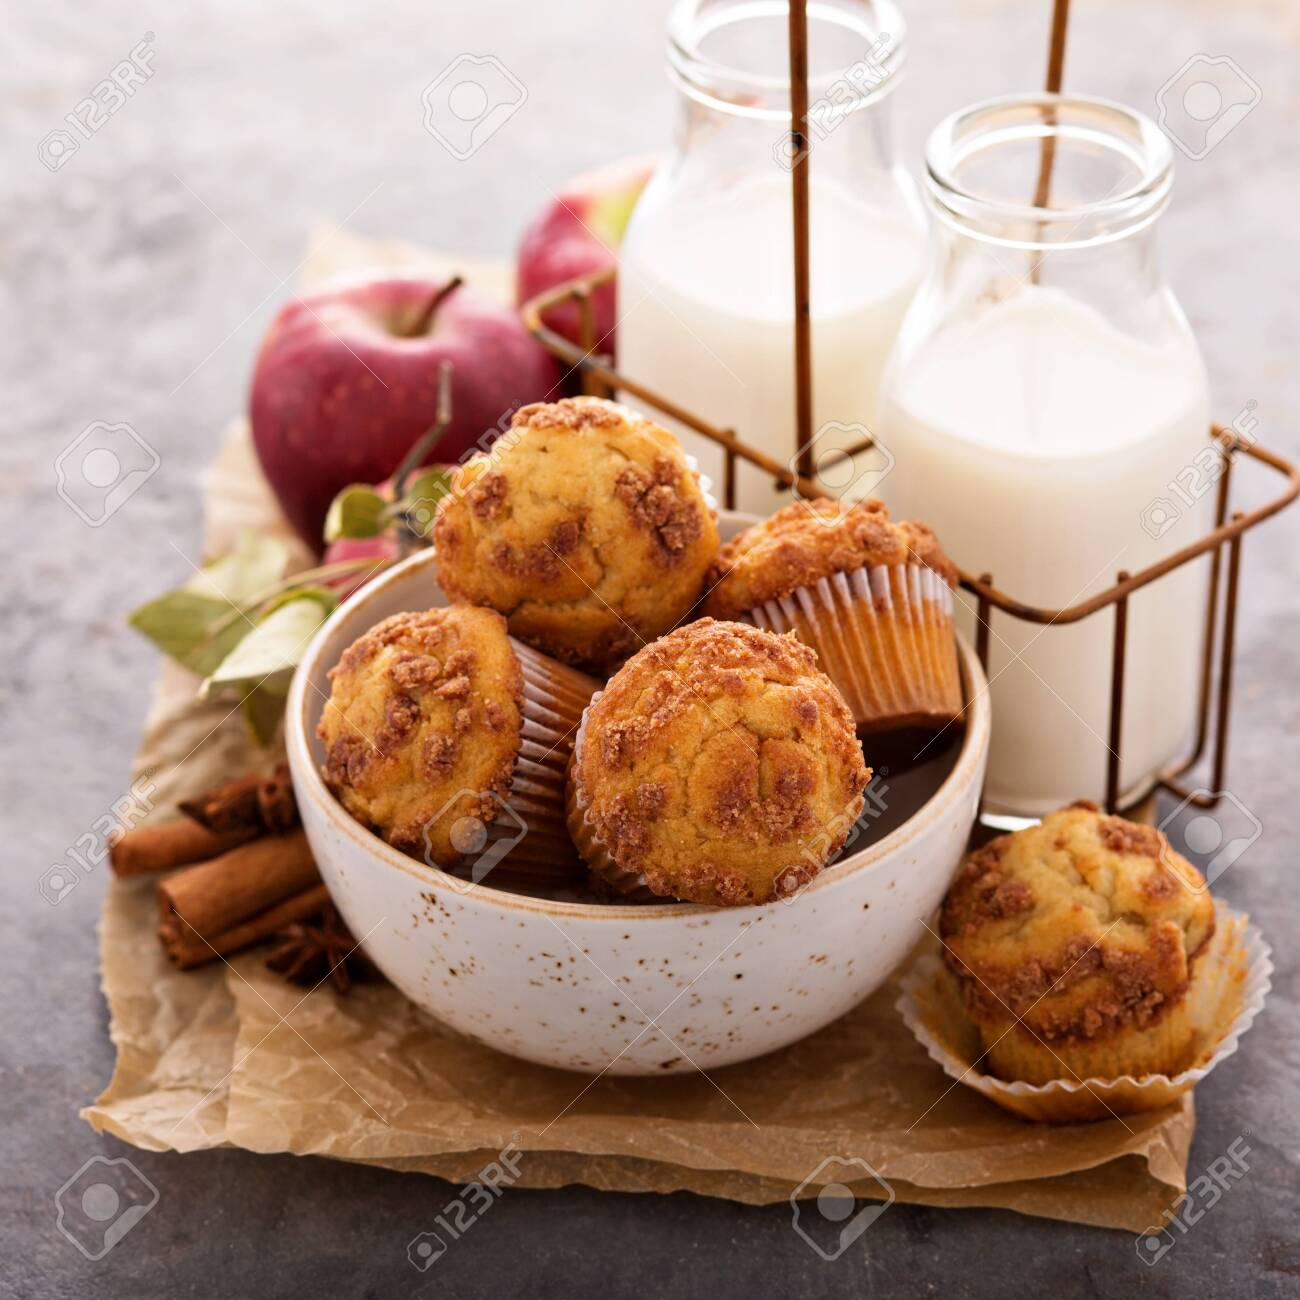 Apple cinnamon streusel muffins with milk bottles - 122038362